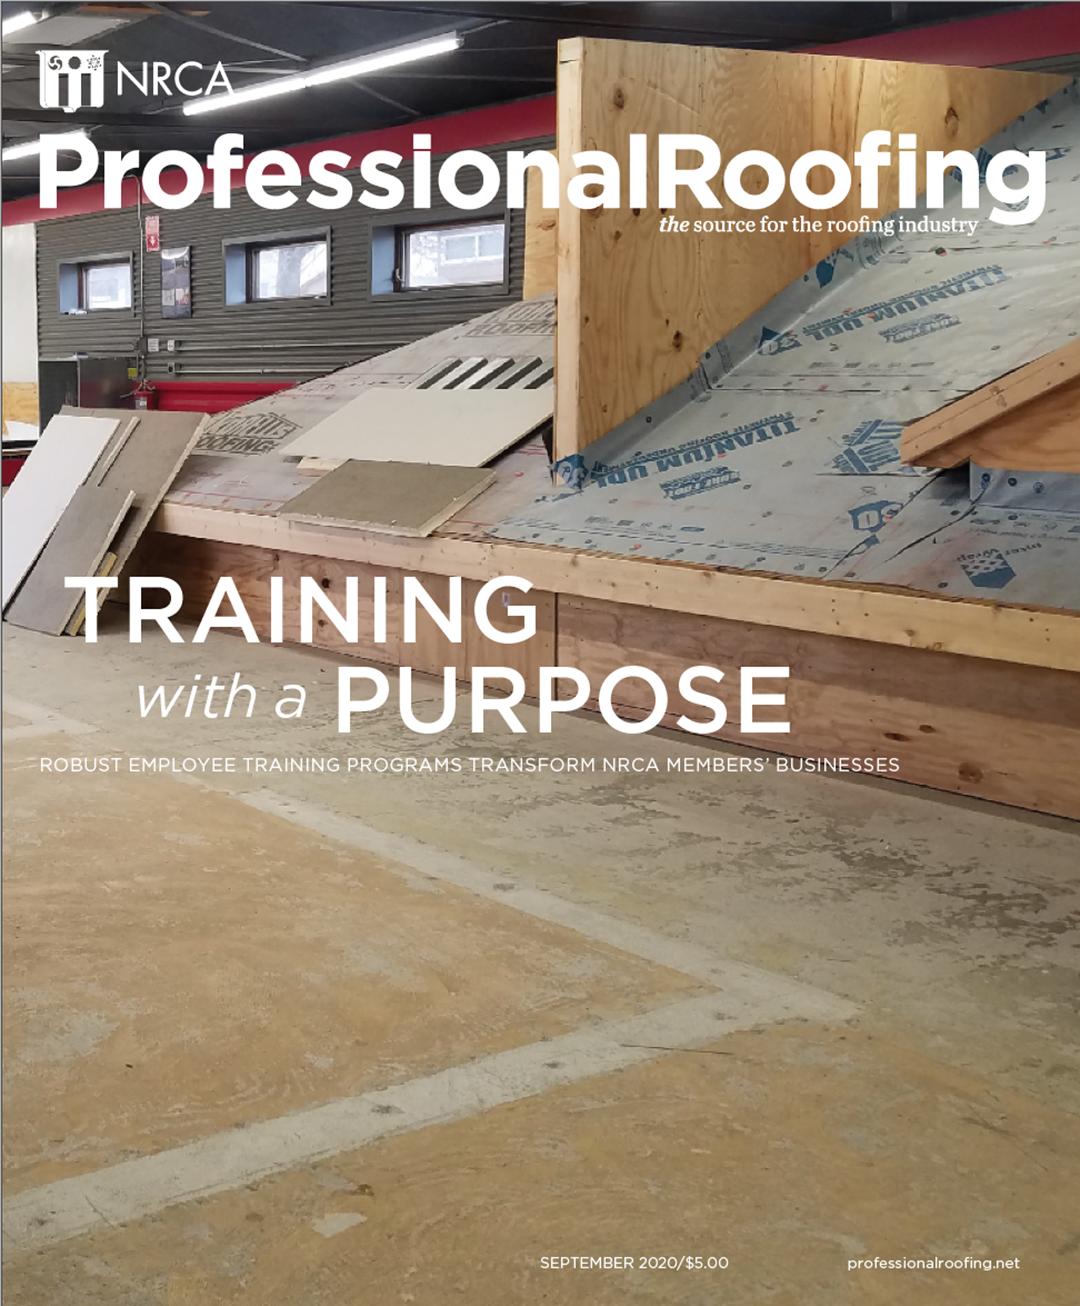 Professional Roofing Magazine 9/1/2020